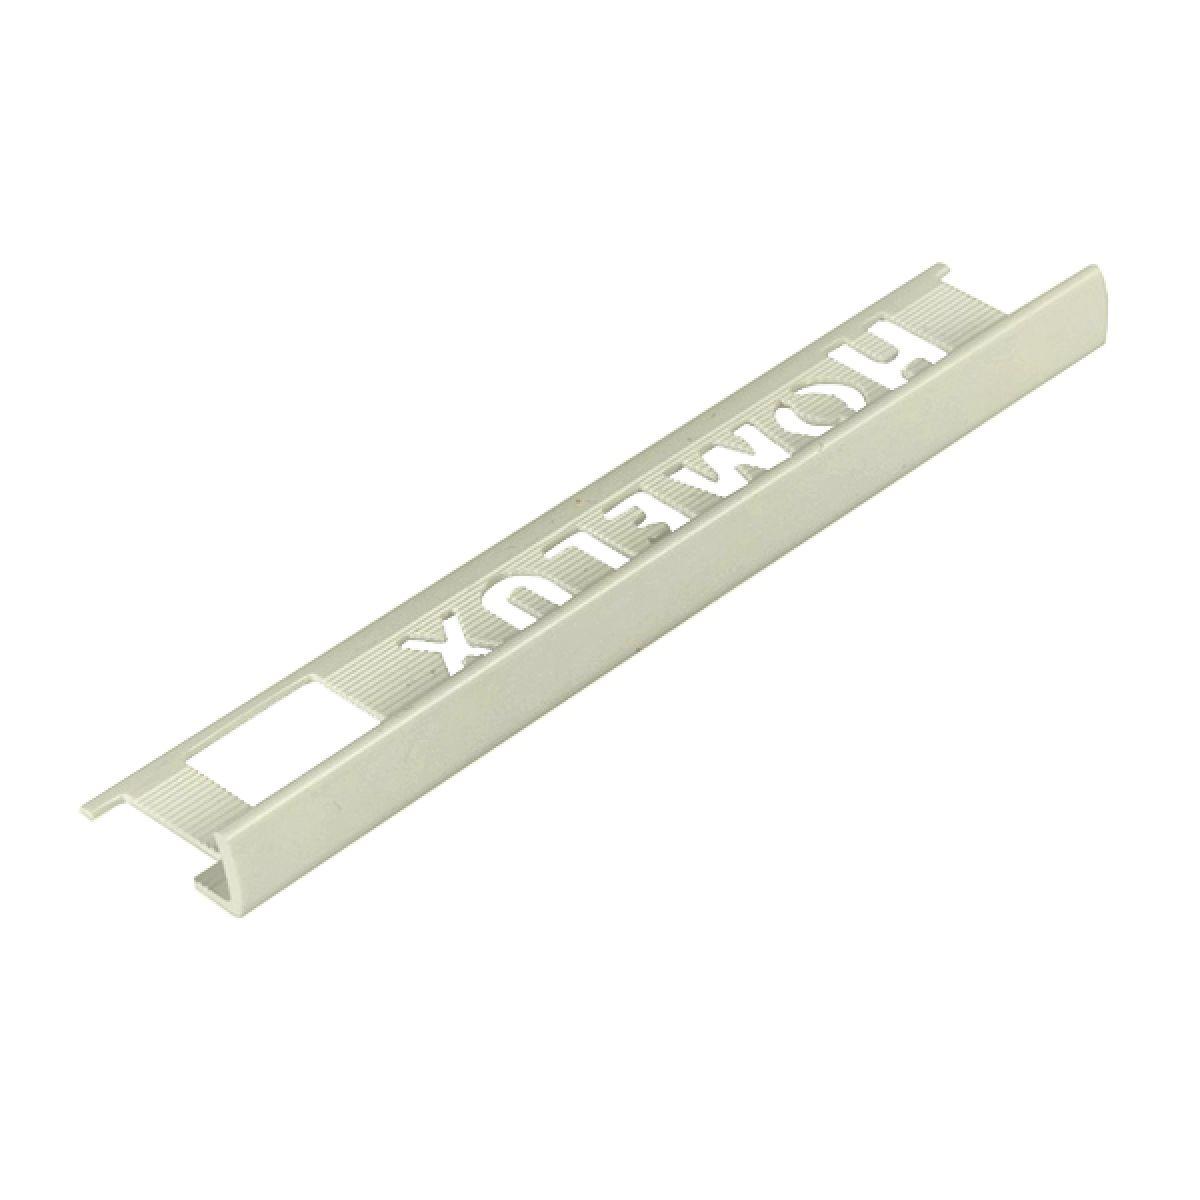 Homelux PVC Straight Edge 8mm Soft Cream Tile Trim 2.5m